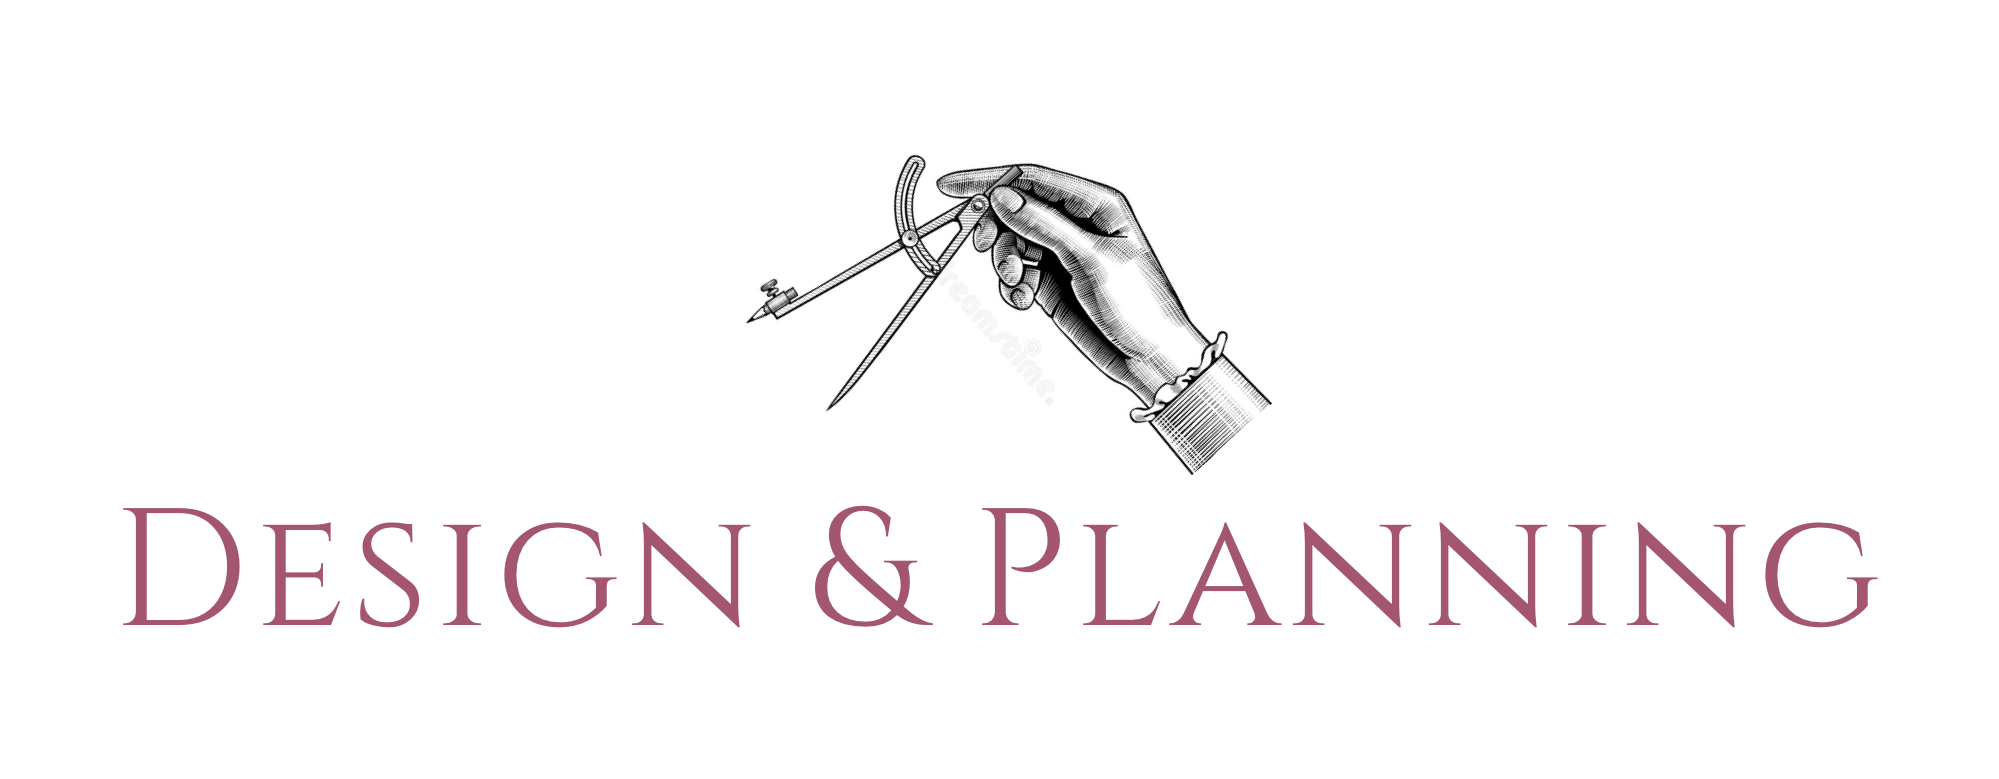 Pennard_Developments_Design_Planning_Fulham